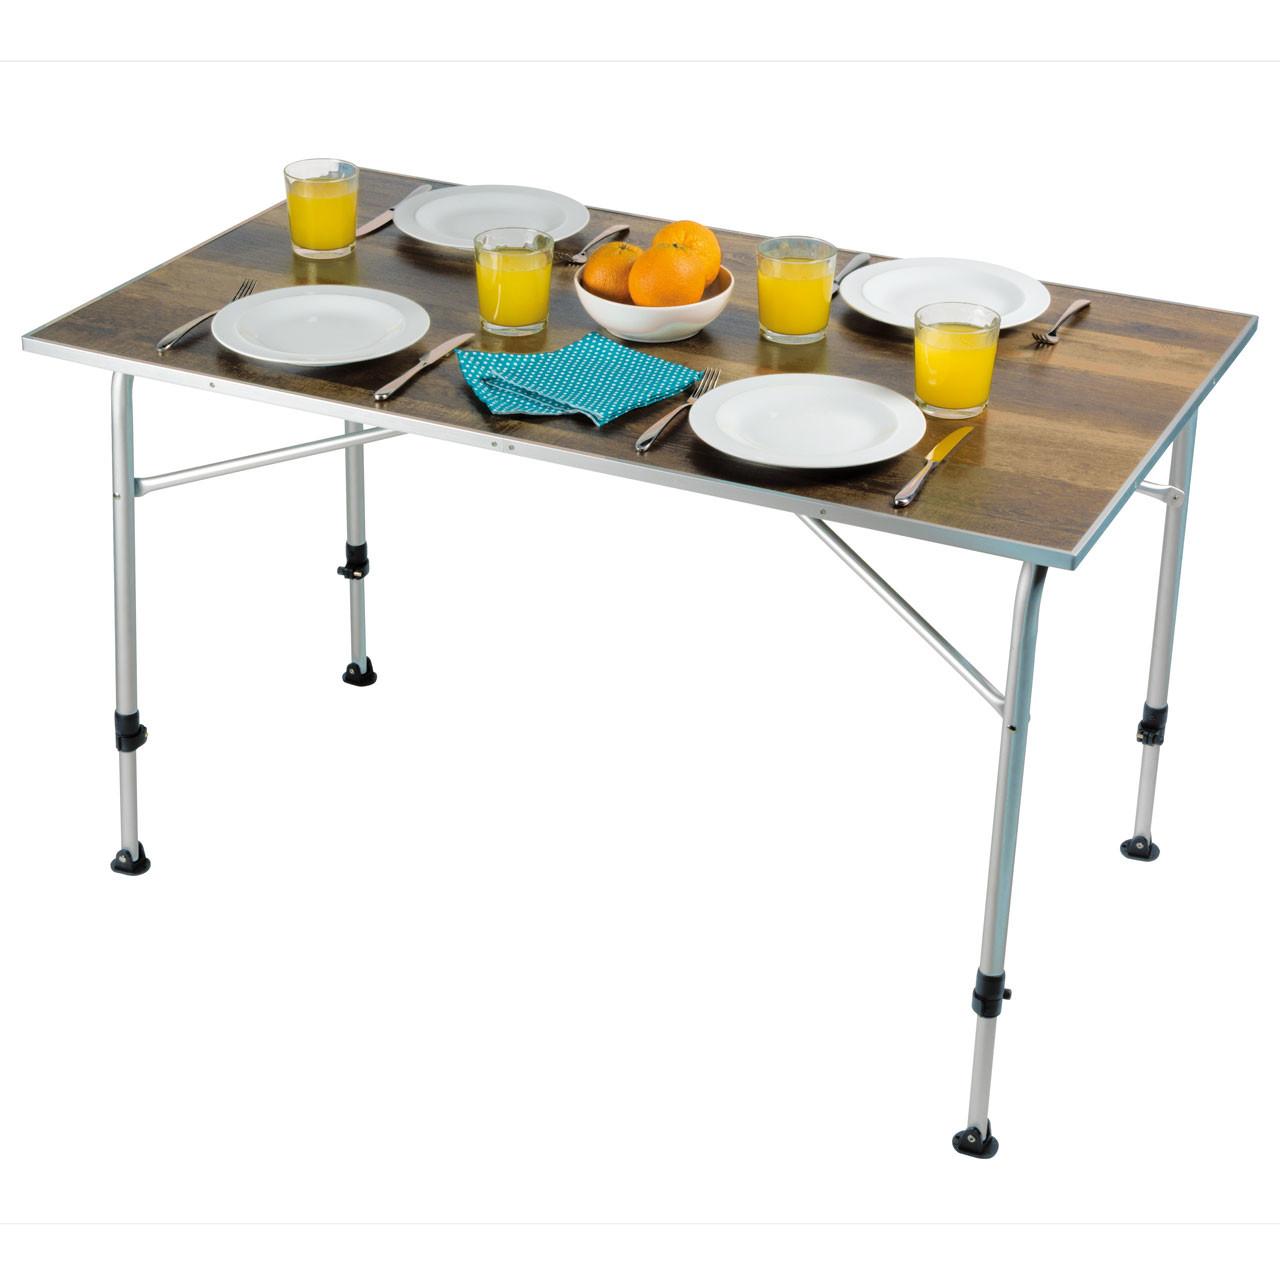 Kampa Zero Table - Large